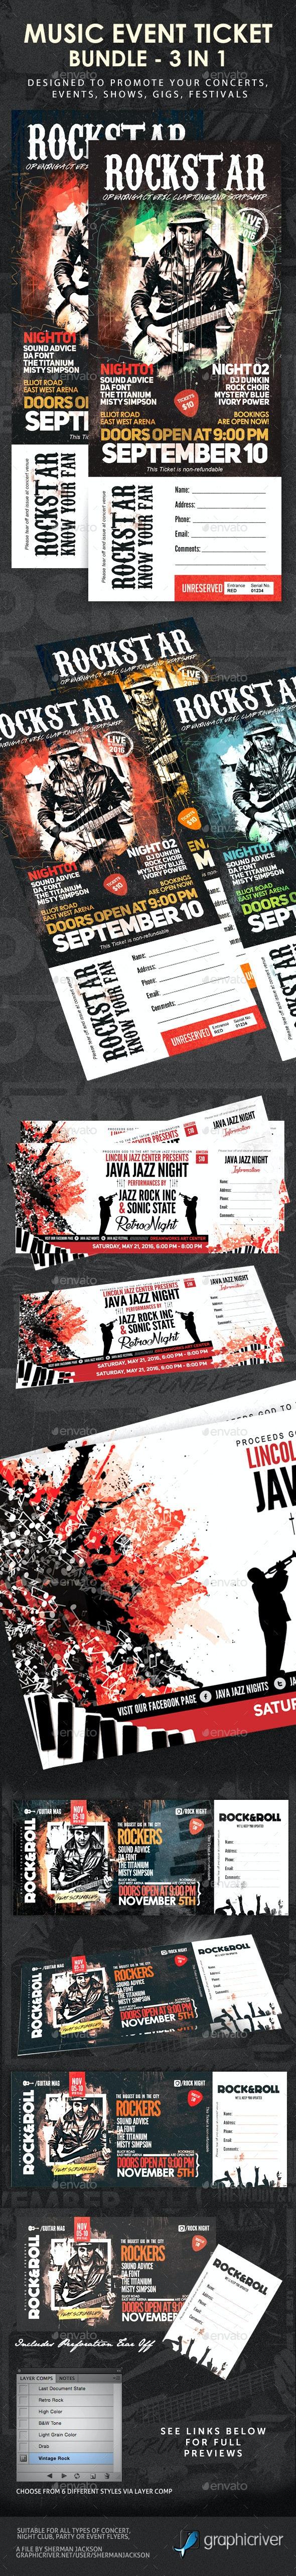 Music Concert Event Festival Ticket Bundle 3 in 1 - Miscellaneous Print Templates